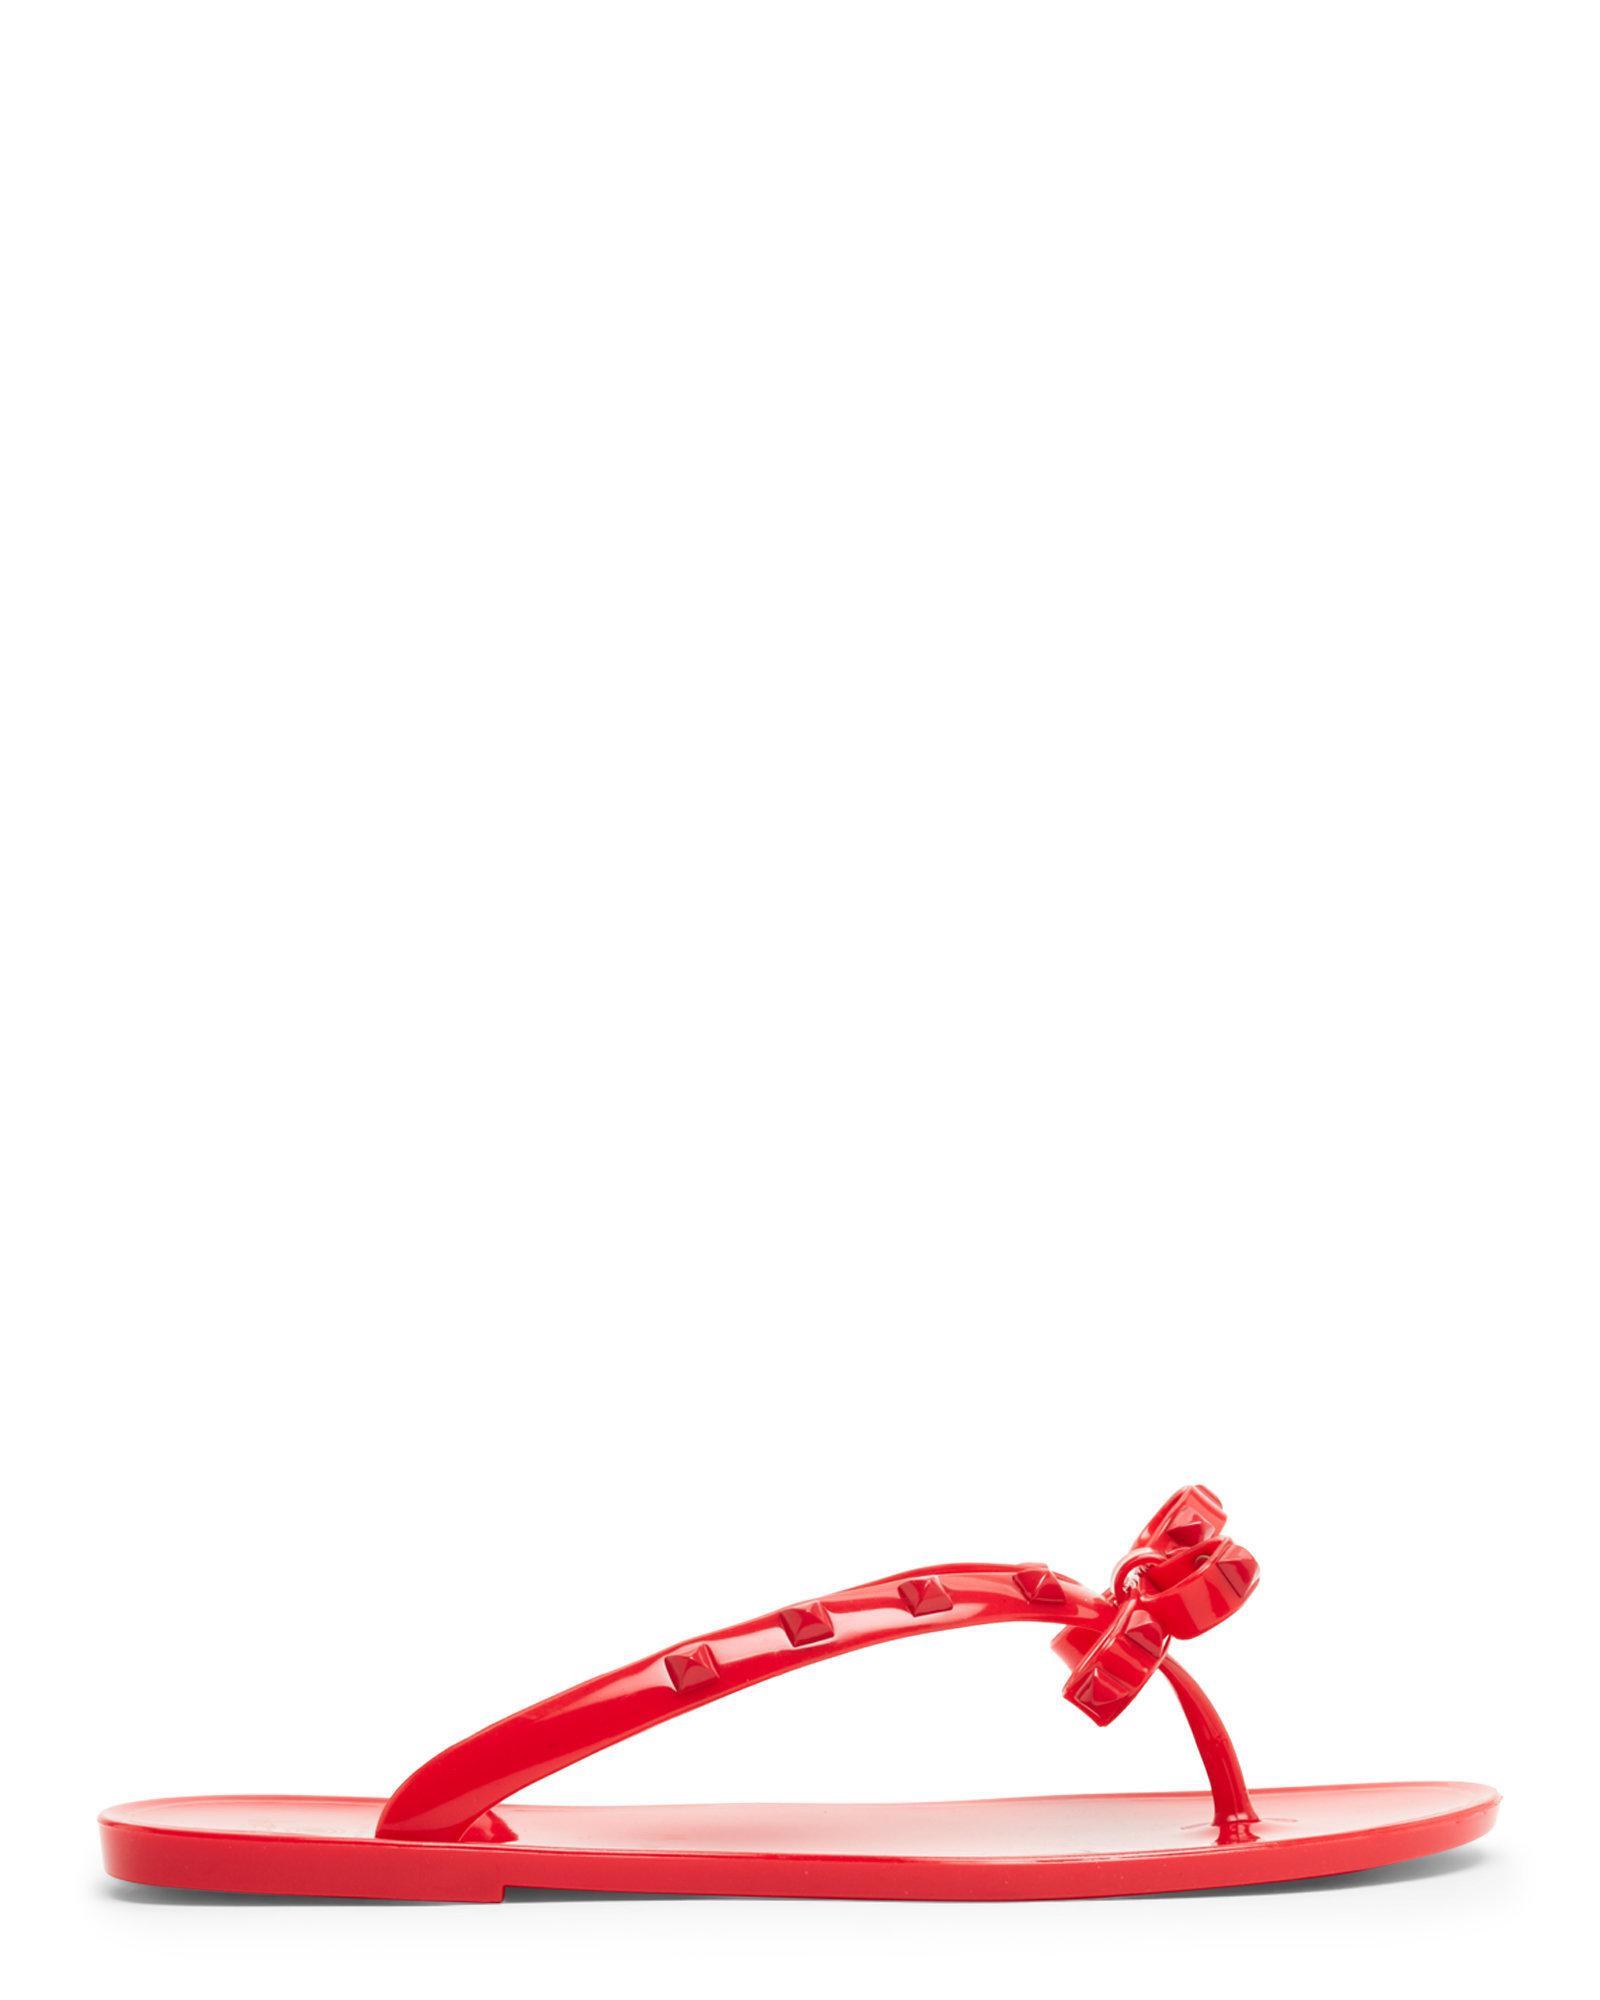 78576eaf2 Lyst - Dizzy Studded Jelly Flip-Flops in Red